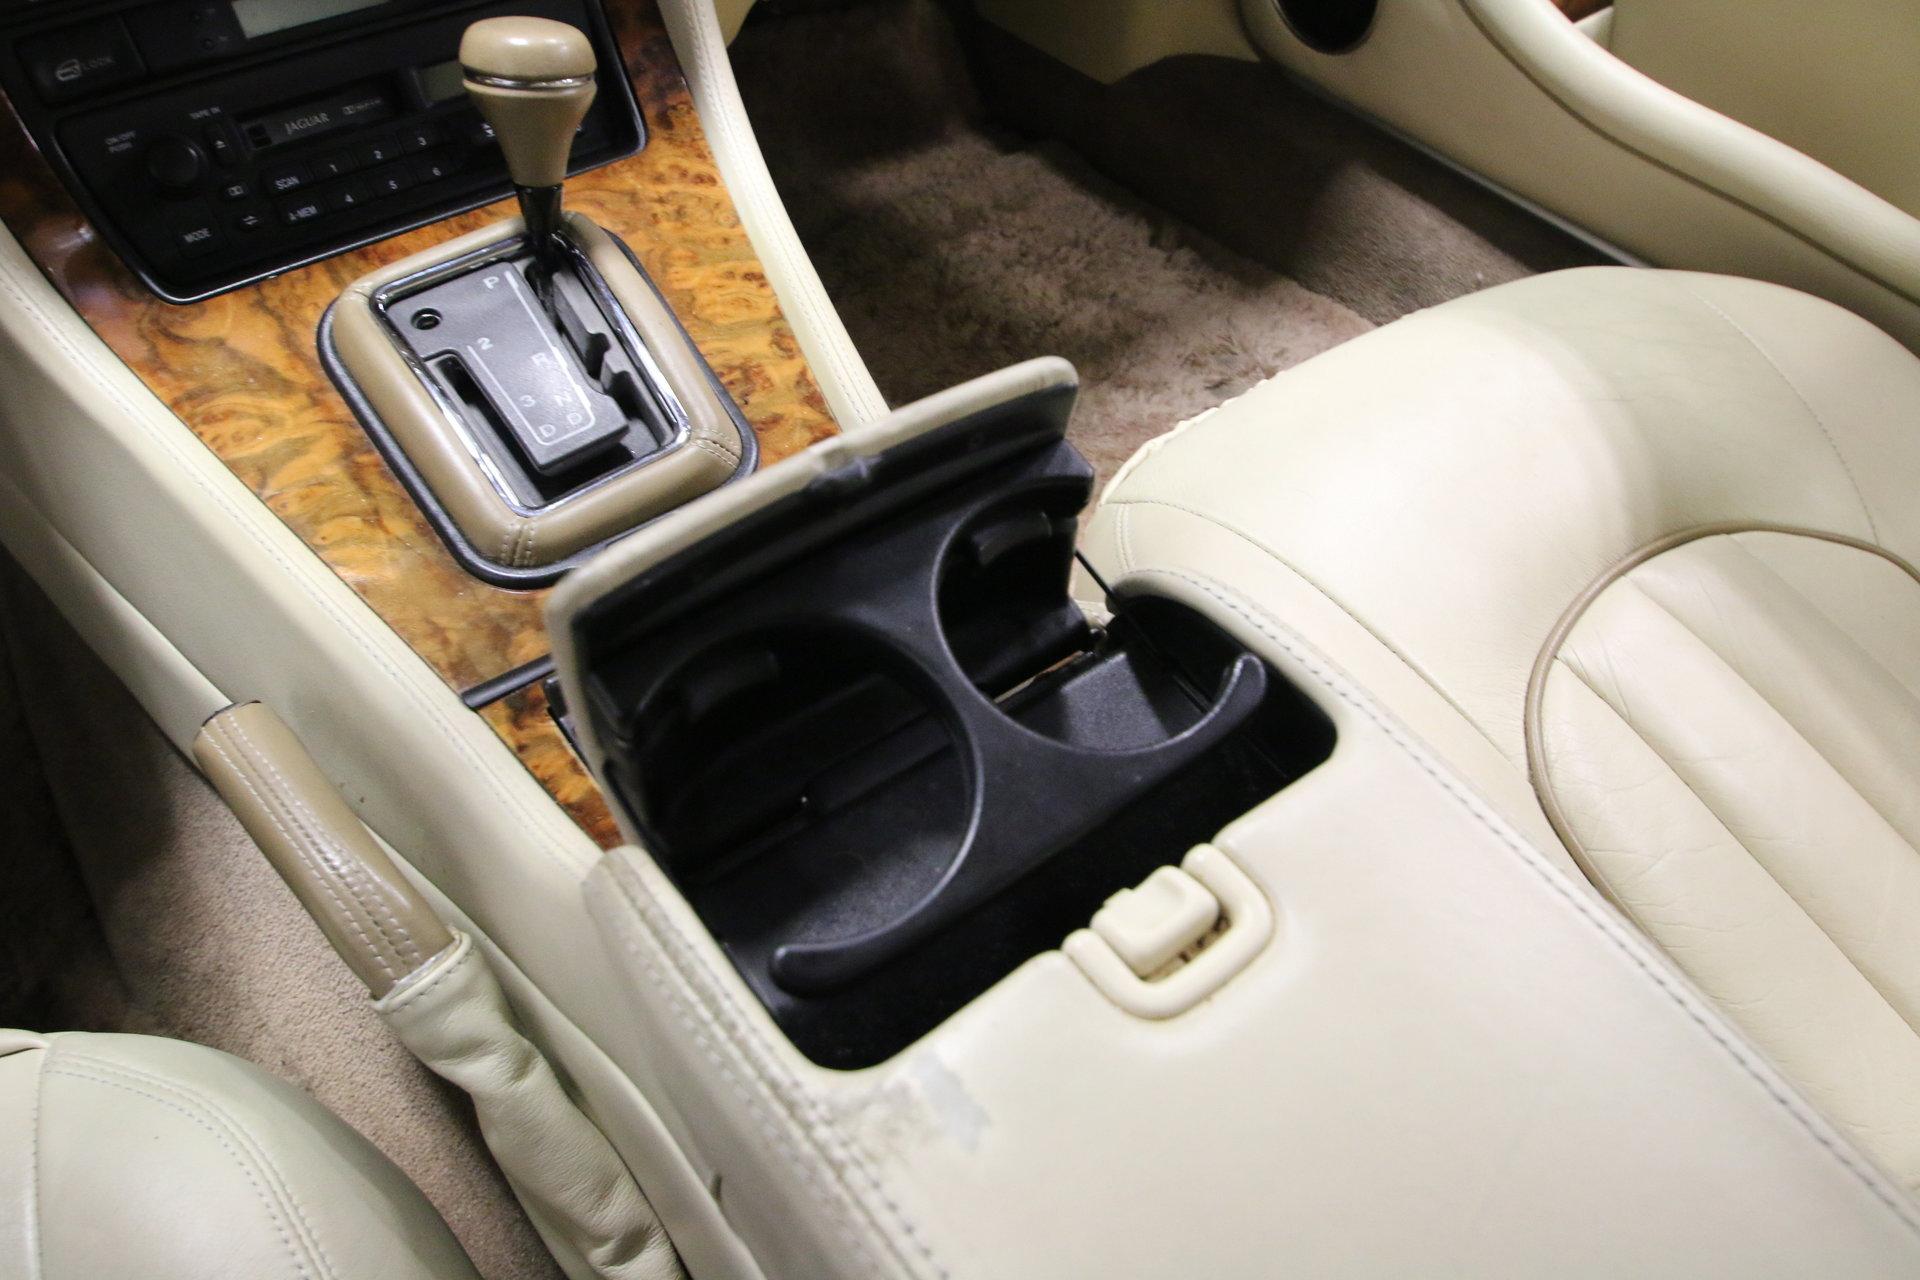 1996 Jaguar Xj Vanden Plas For Sale 81524 Mcg Xj6